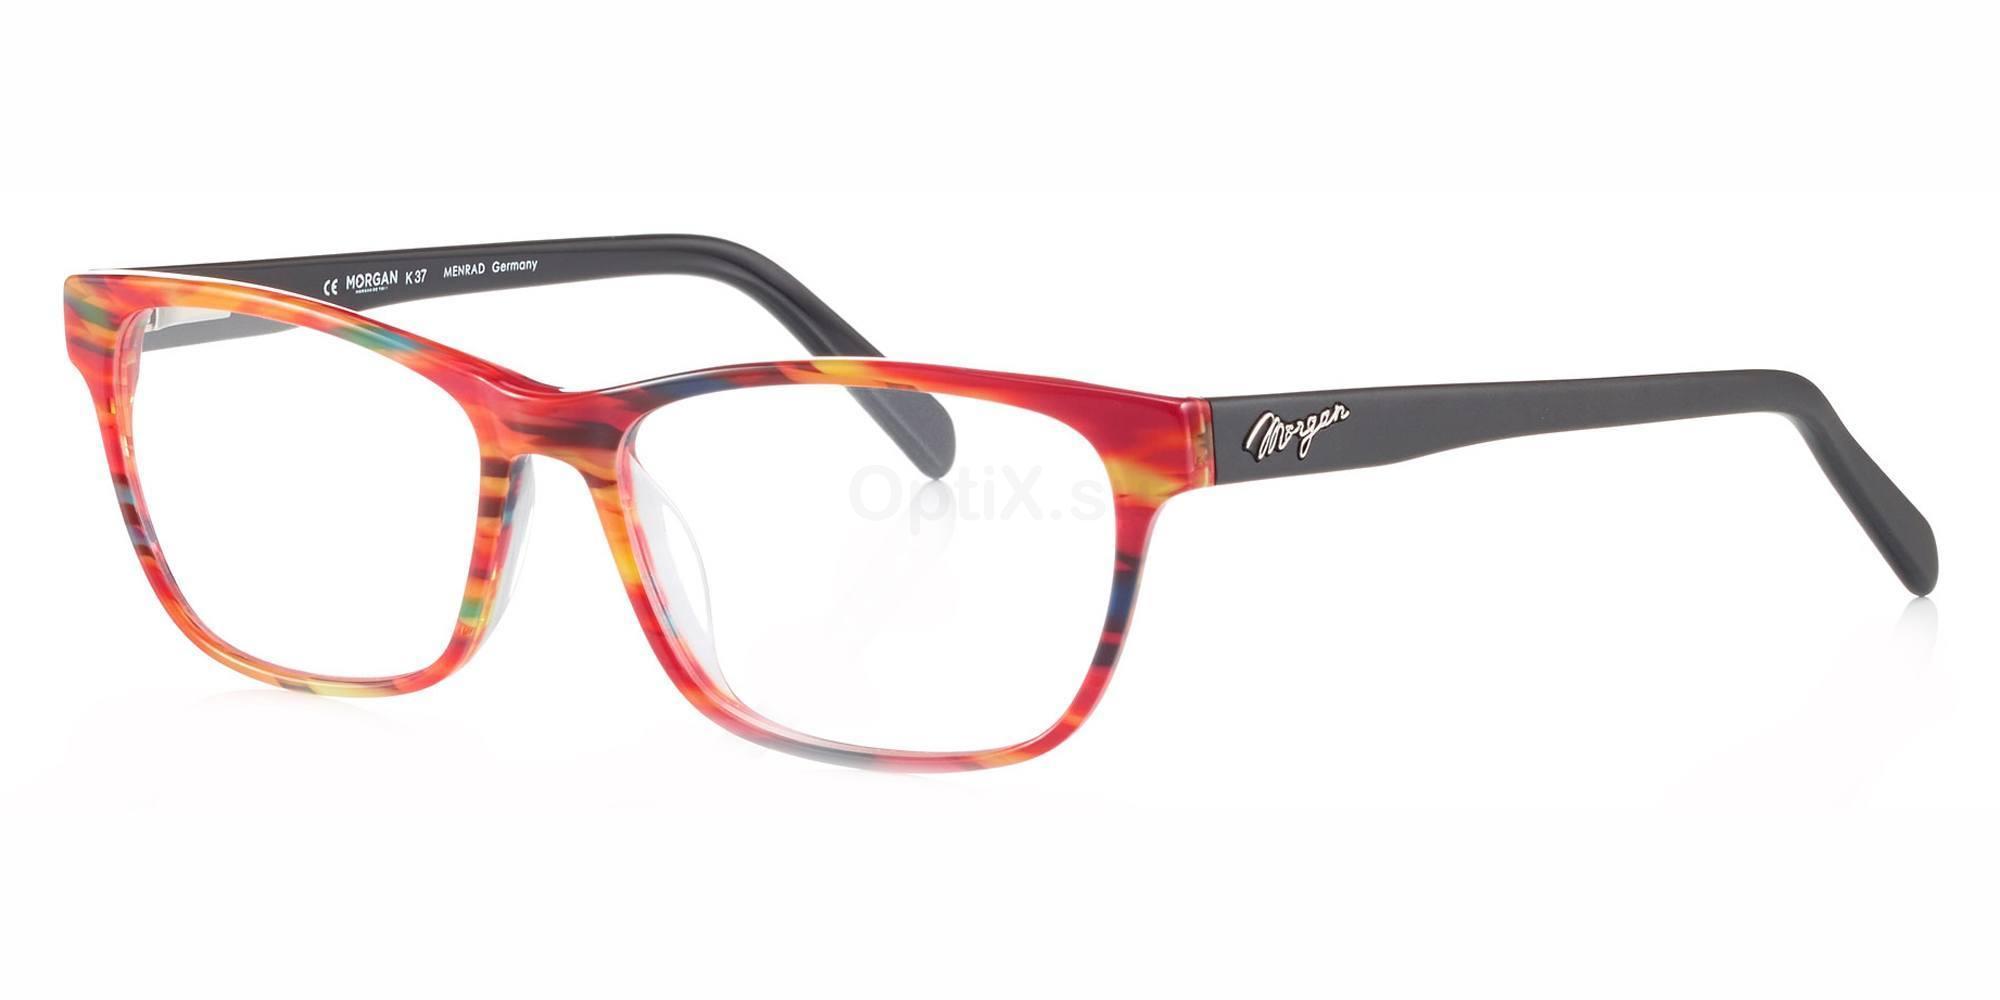 4225 201106 , MORGAN Eyewear